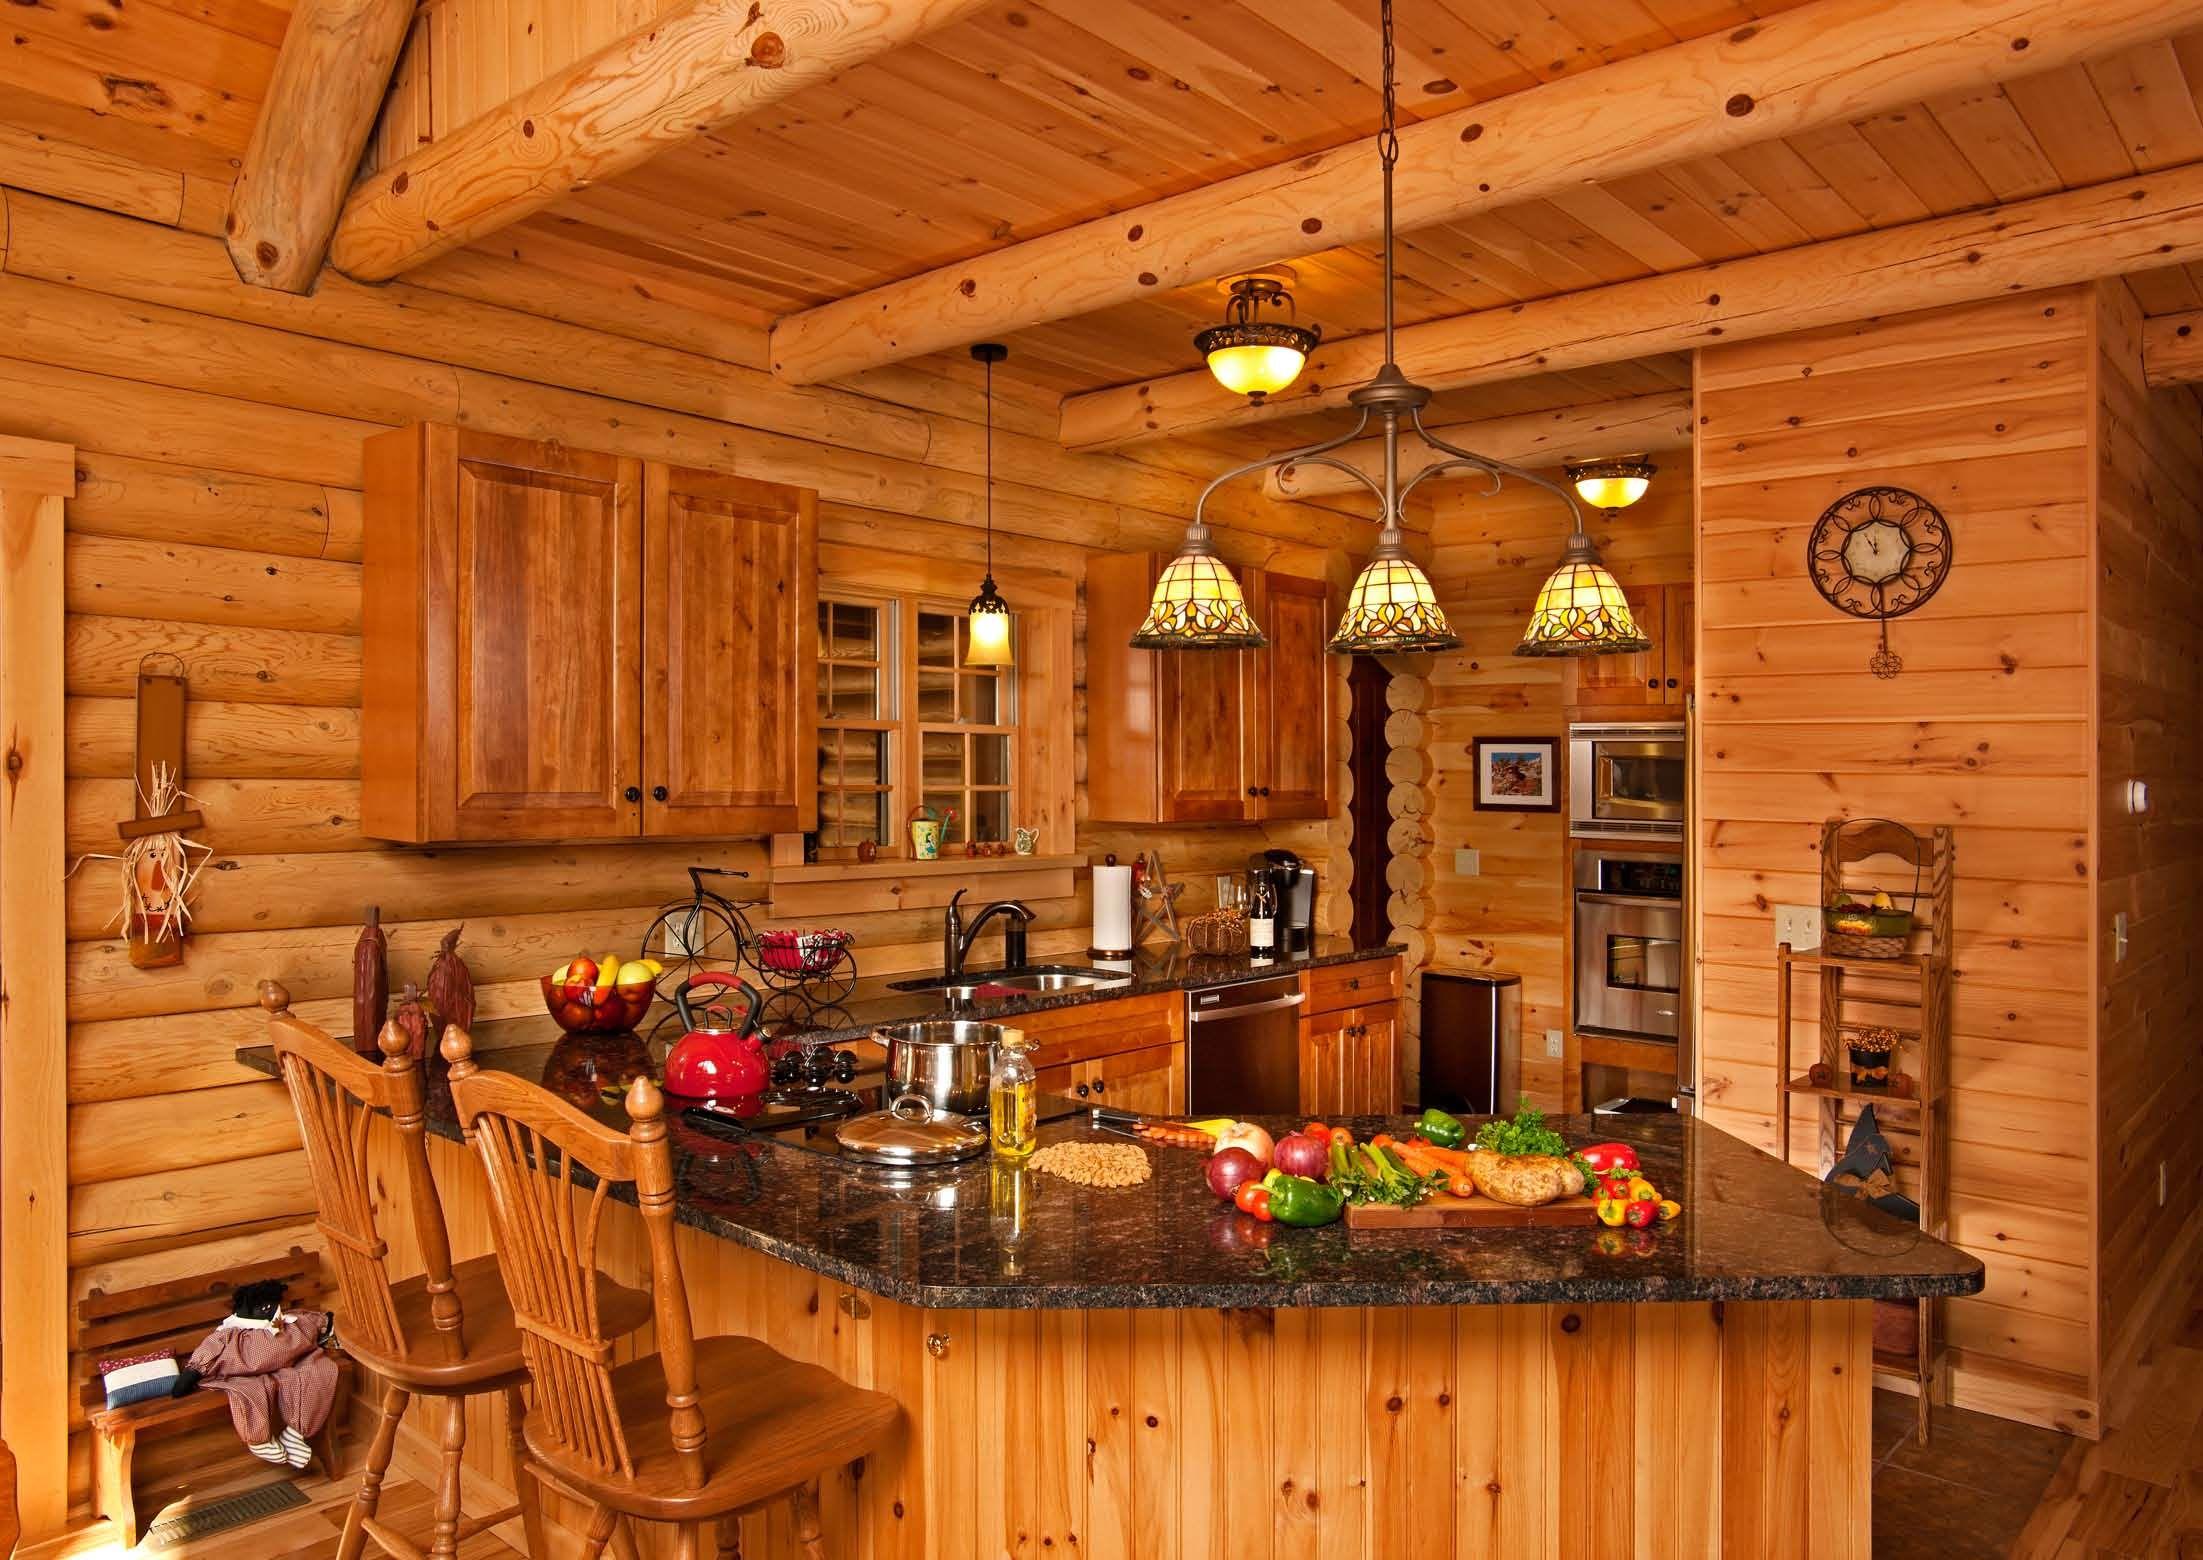 Country log home kitchen hiawatha log home kitchens country log home kitchen hiawatha dzzzfo